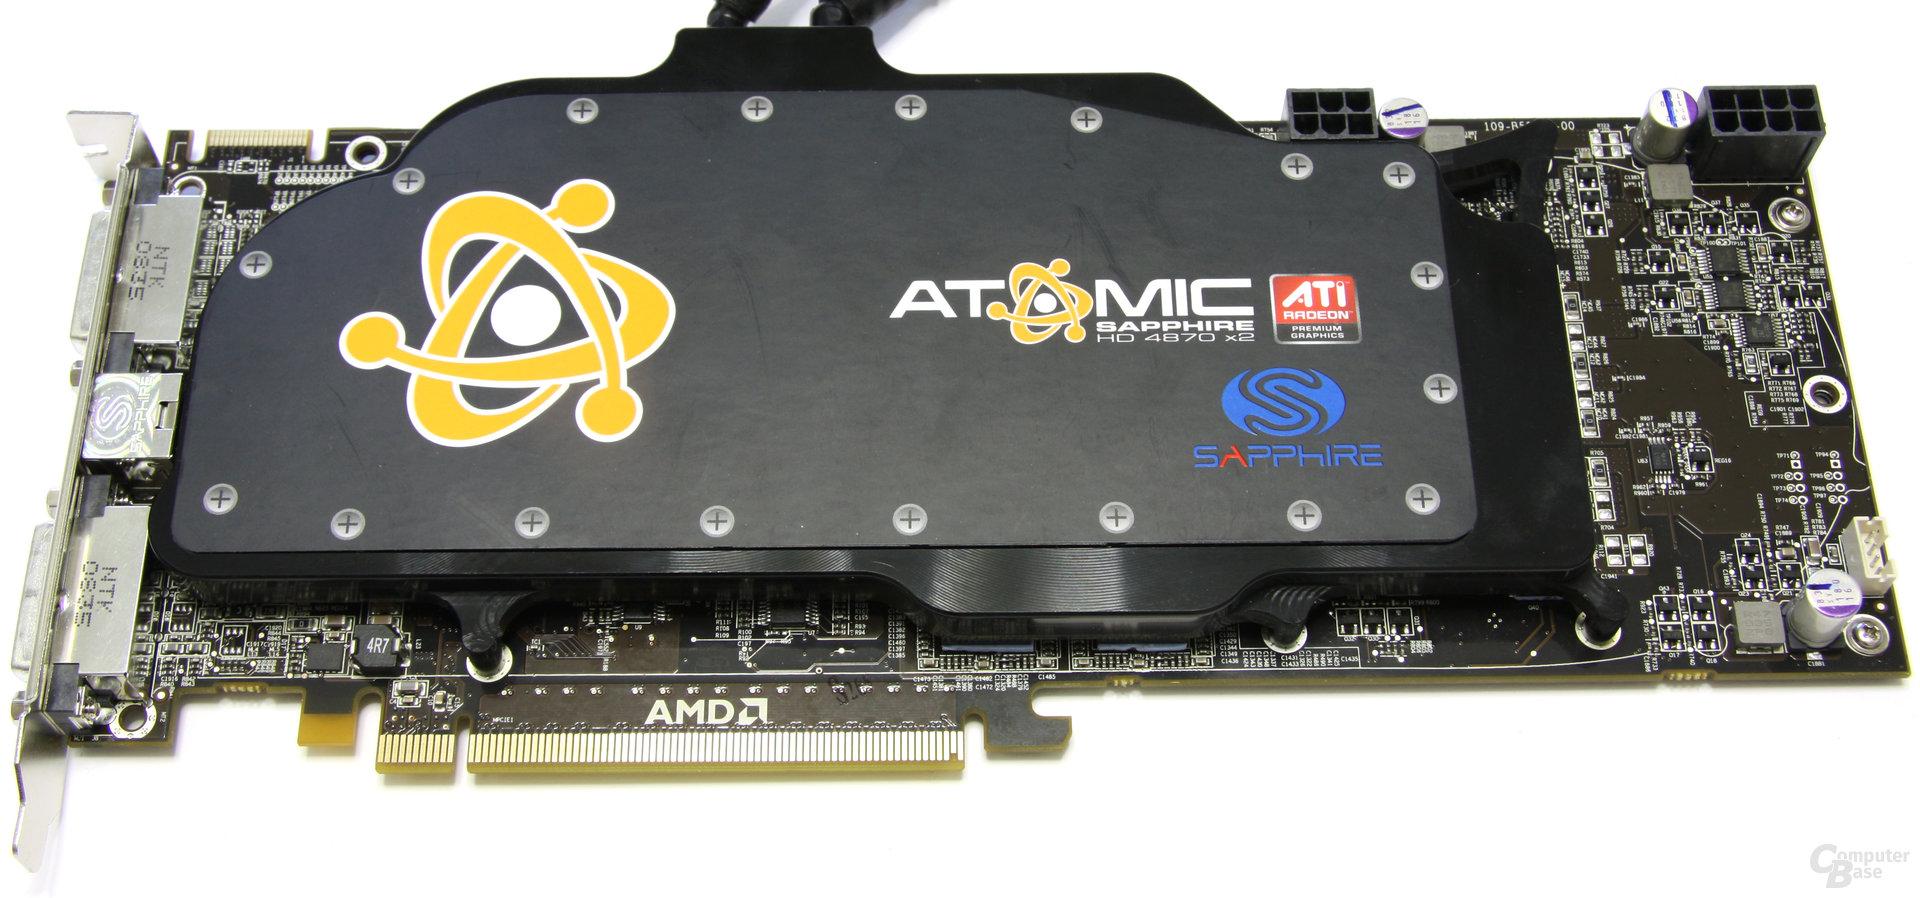 Sapphire Radeon HD 4870 X2 Atomic